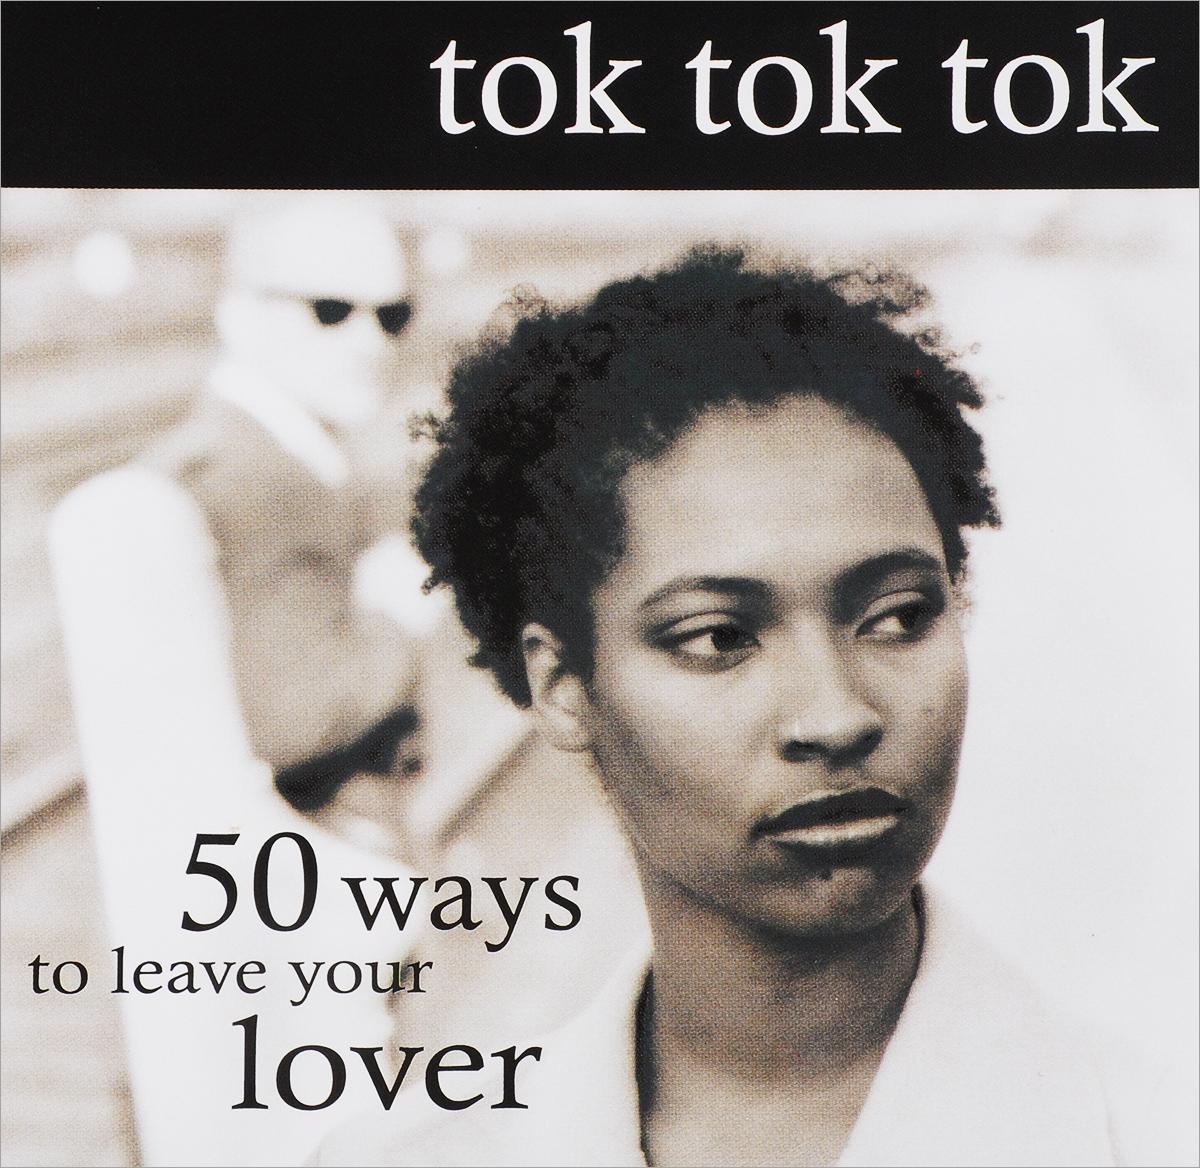 Tok Tok Tok Tok Tok Tok. 50 Ways To Leave Your Lover tok tok tok tok tok tok gershwin with strings page 3 page 10 page 5 page 2